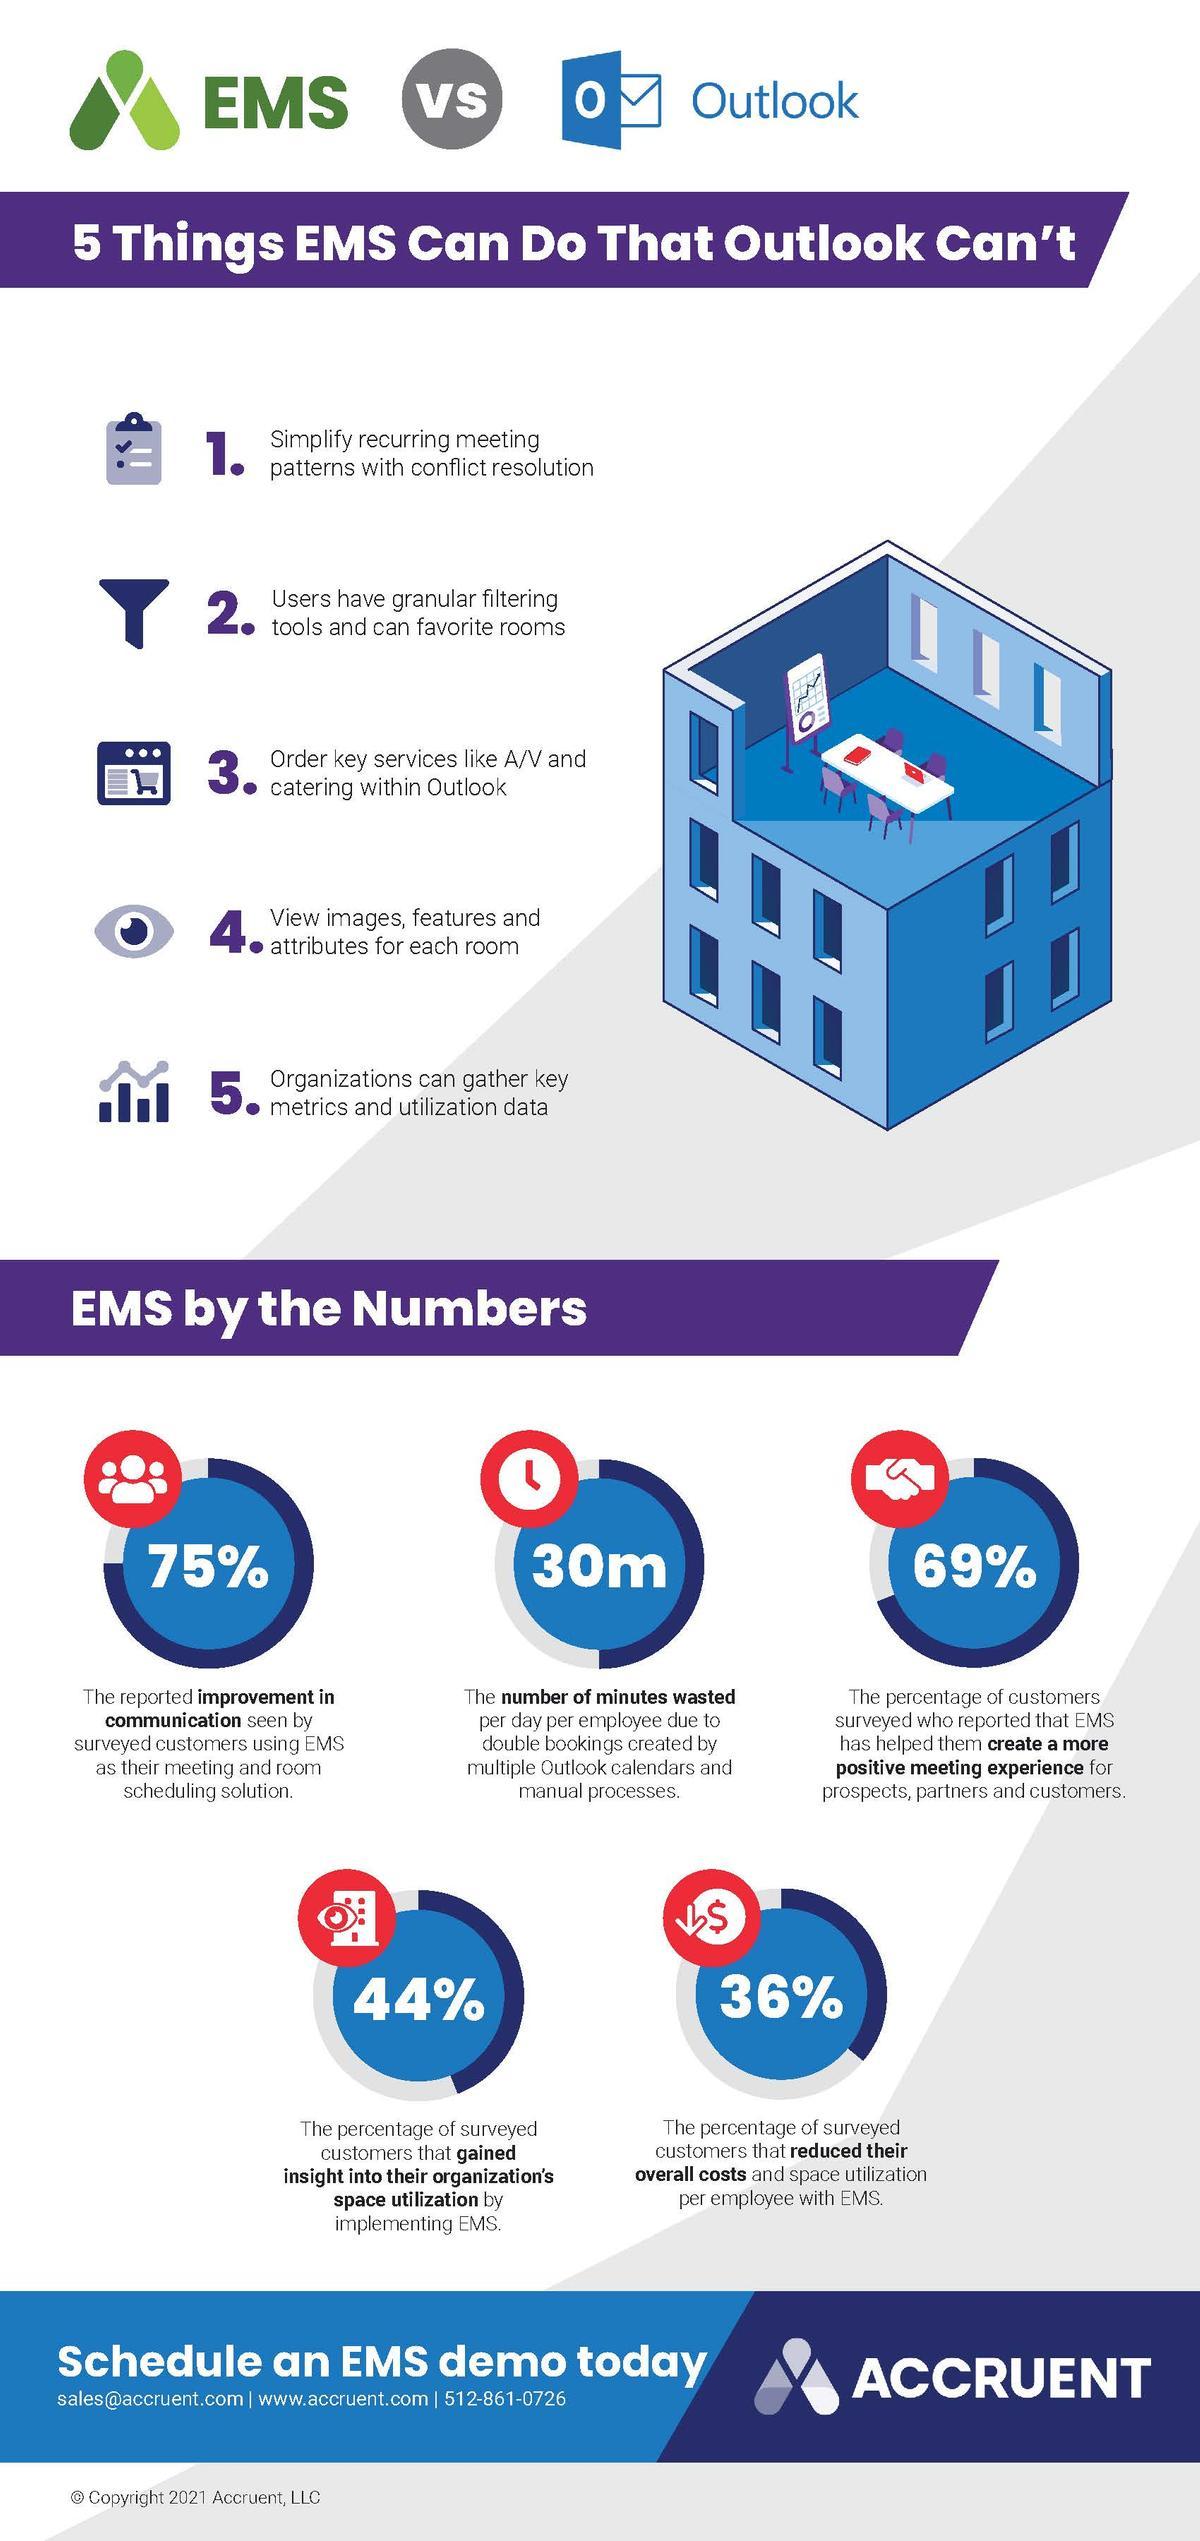 Accruent - Resources - Infographics - EMS vs Outlook - Hero